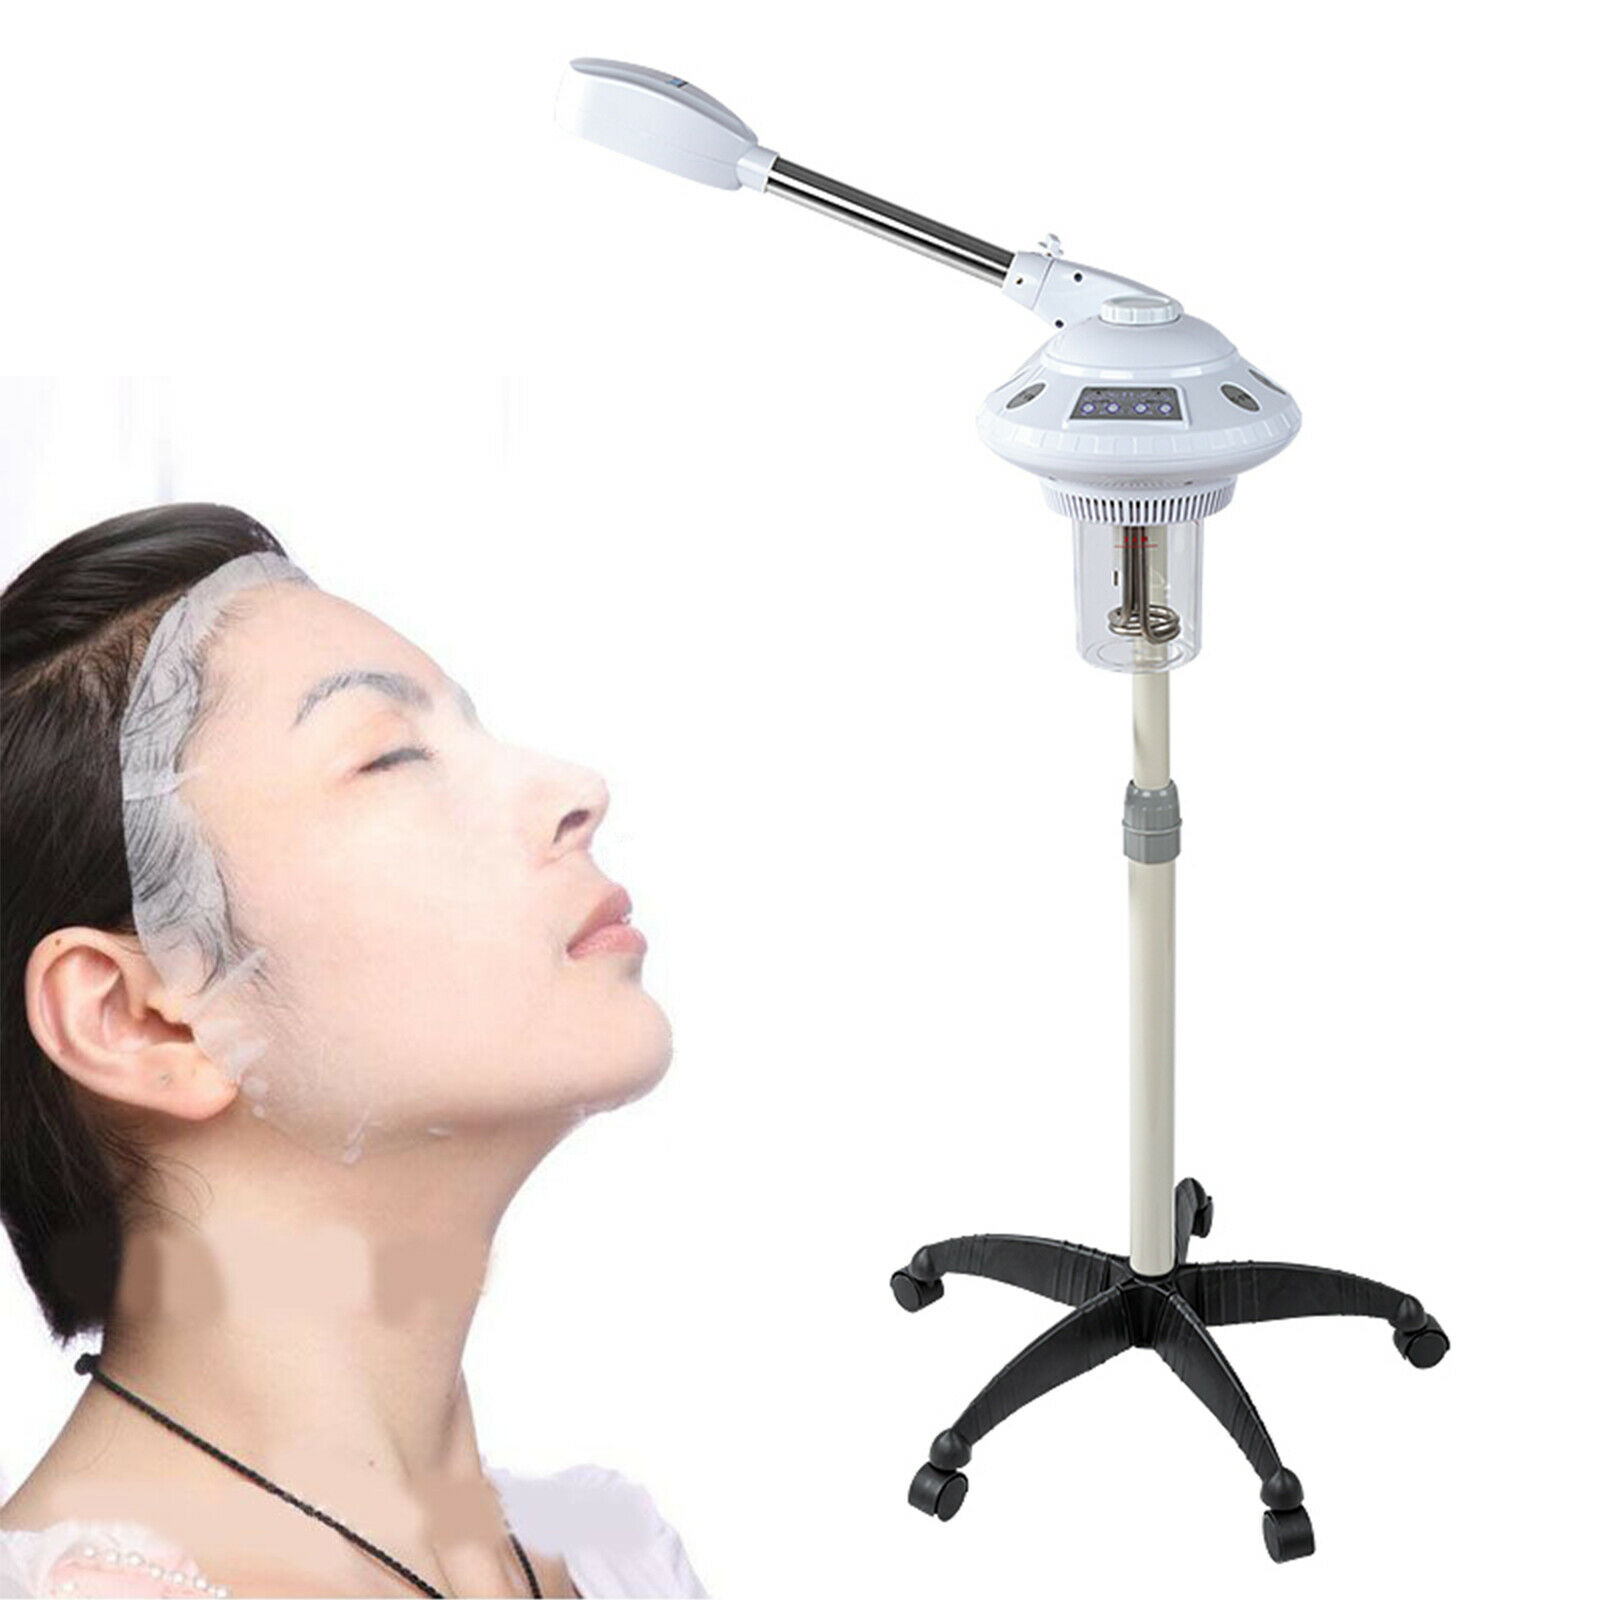 Neu Vapozon Aroma Ozon Bedampfer Dampfgerät Peeling Gerät Verdampfer Salon